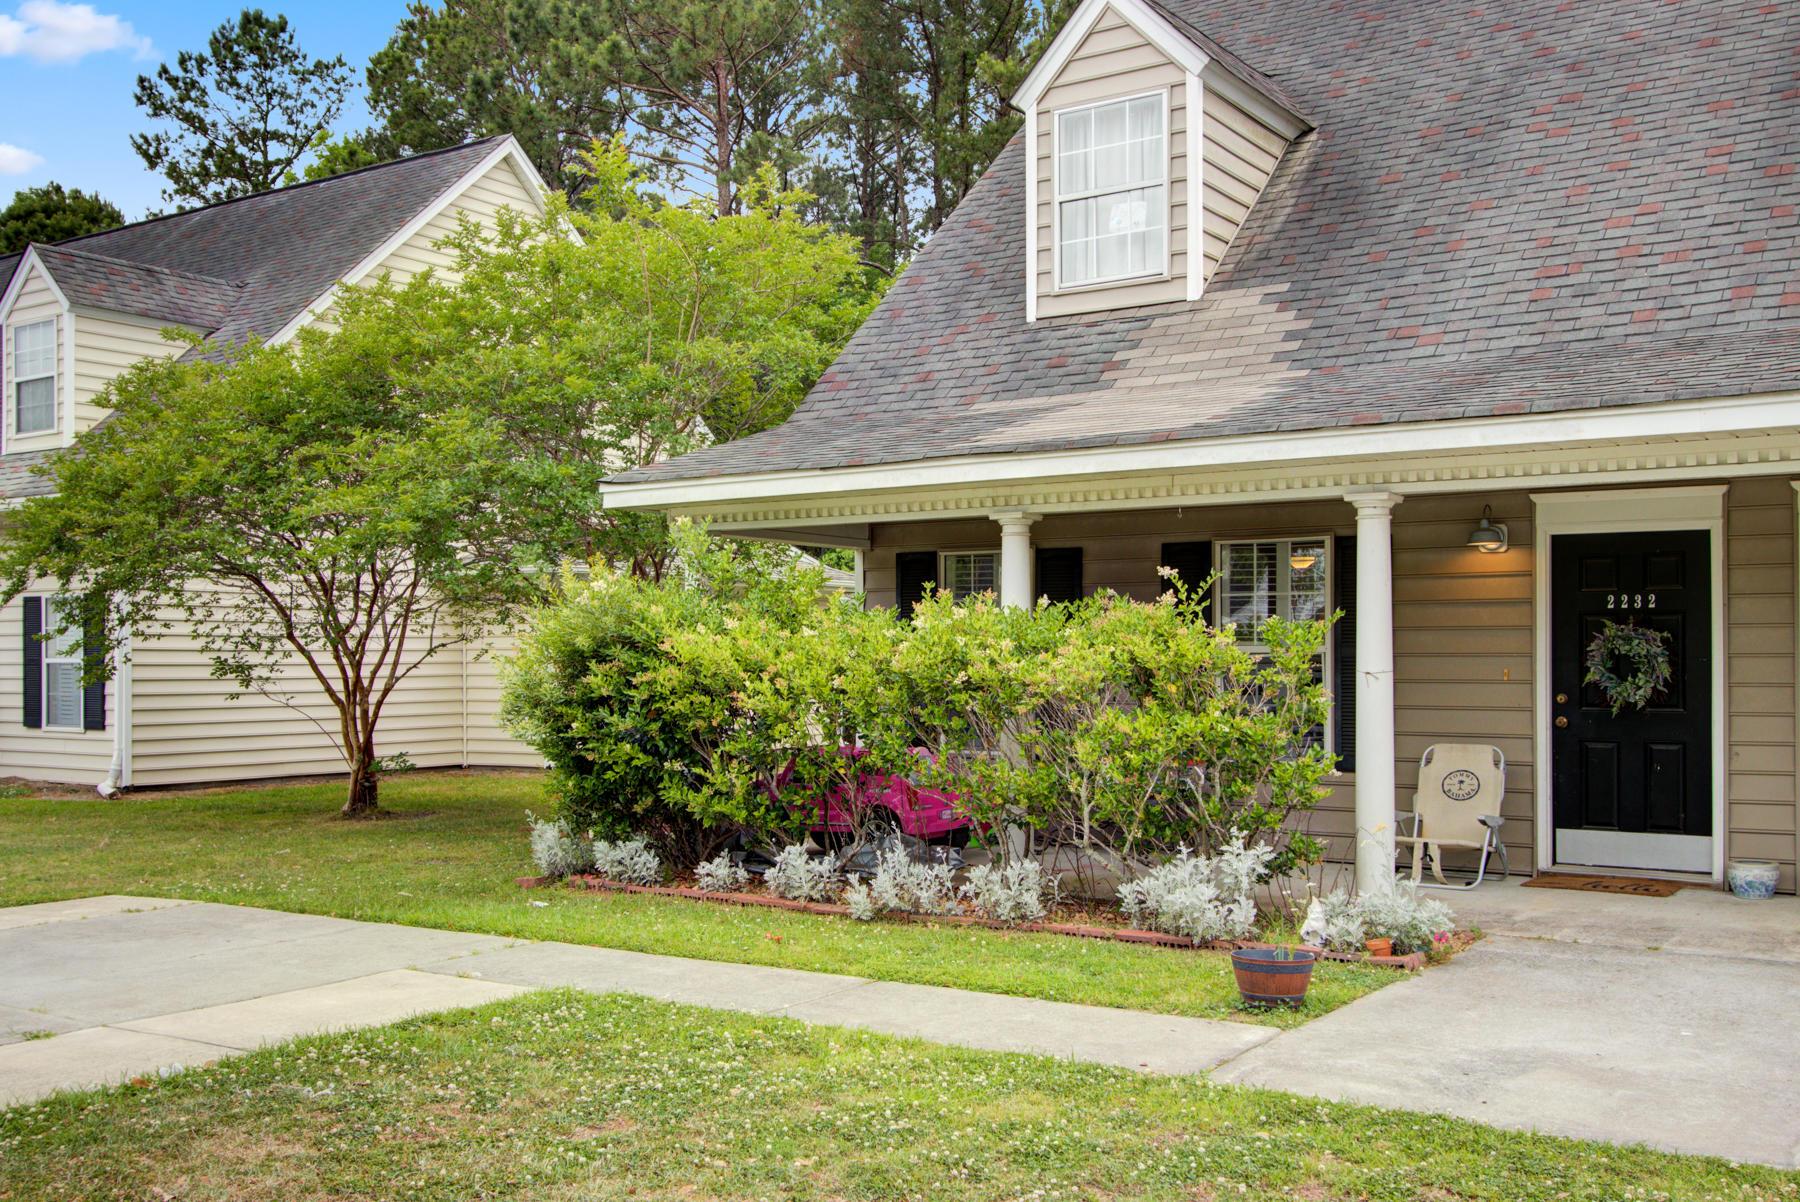 Dunes West Homes For Sale - 2232 Kings Gate, Mount Pleasant, SC - 22